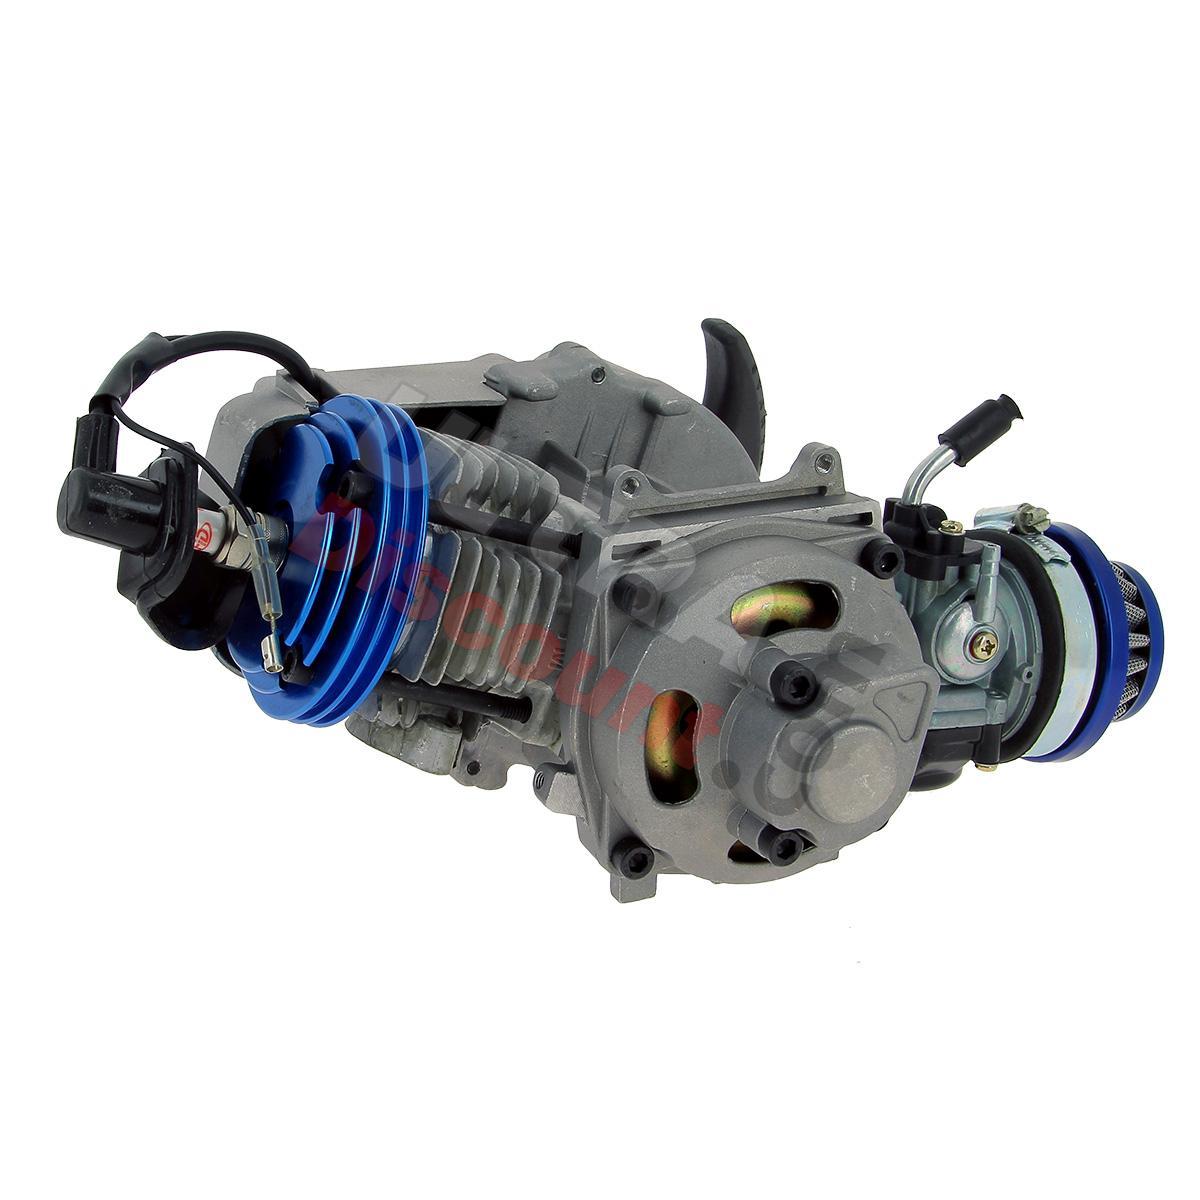 moteur complet bleu ud racing 53cc pour pocket quad pieces pocket quad moteurs ultra. Black Bedroom Furniture Sets. Home Design Ideas